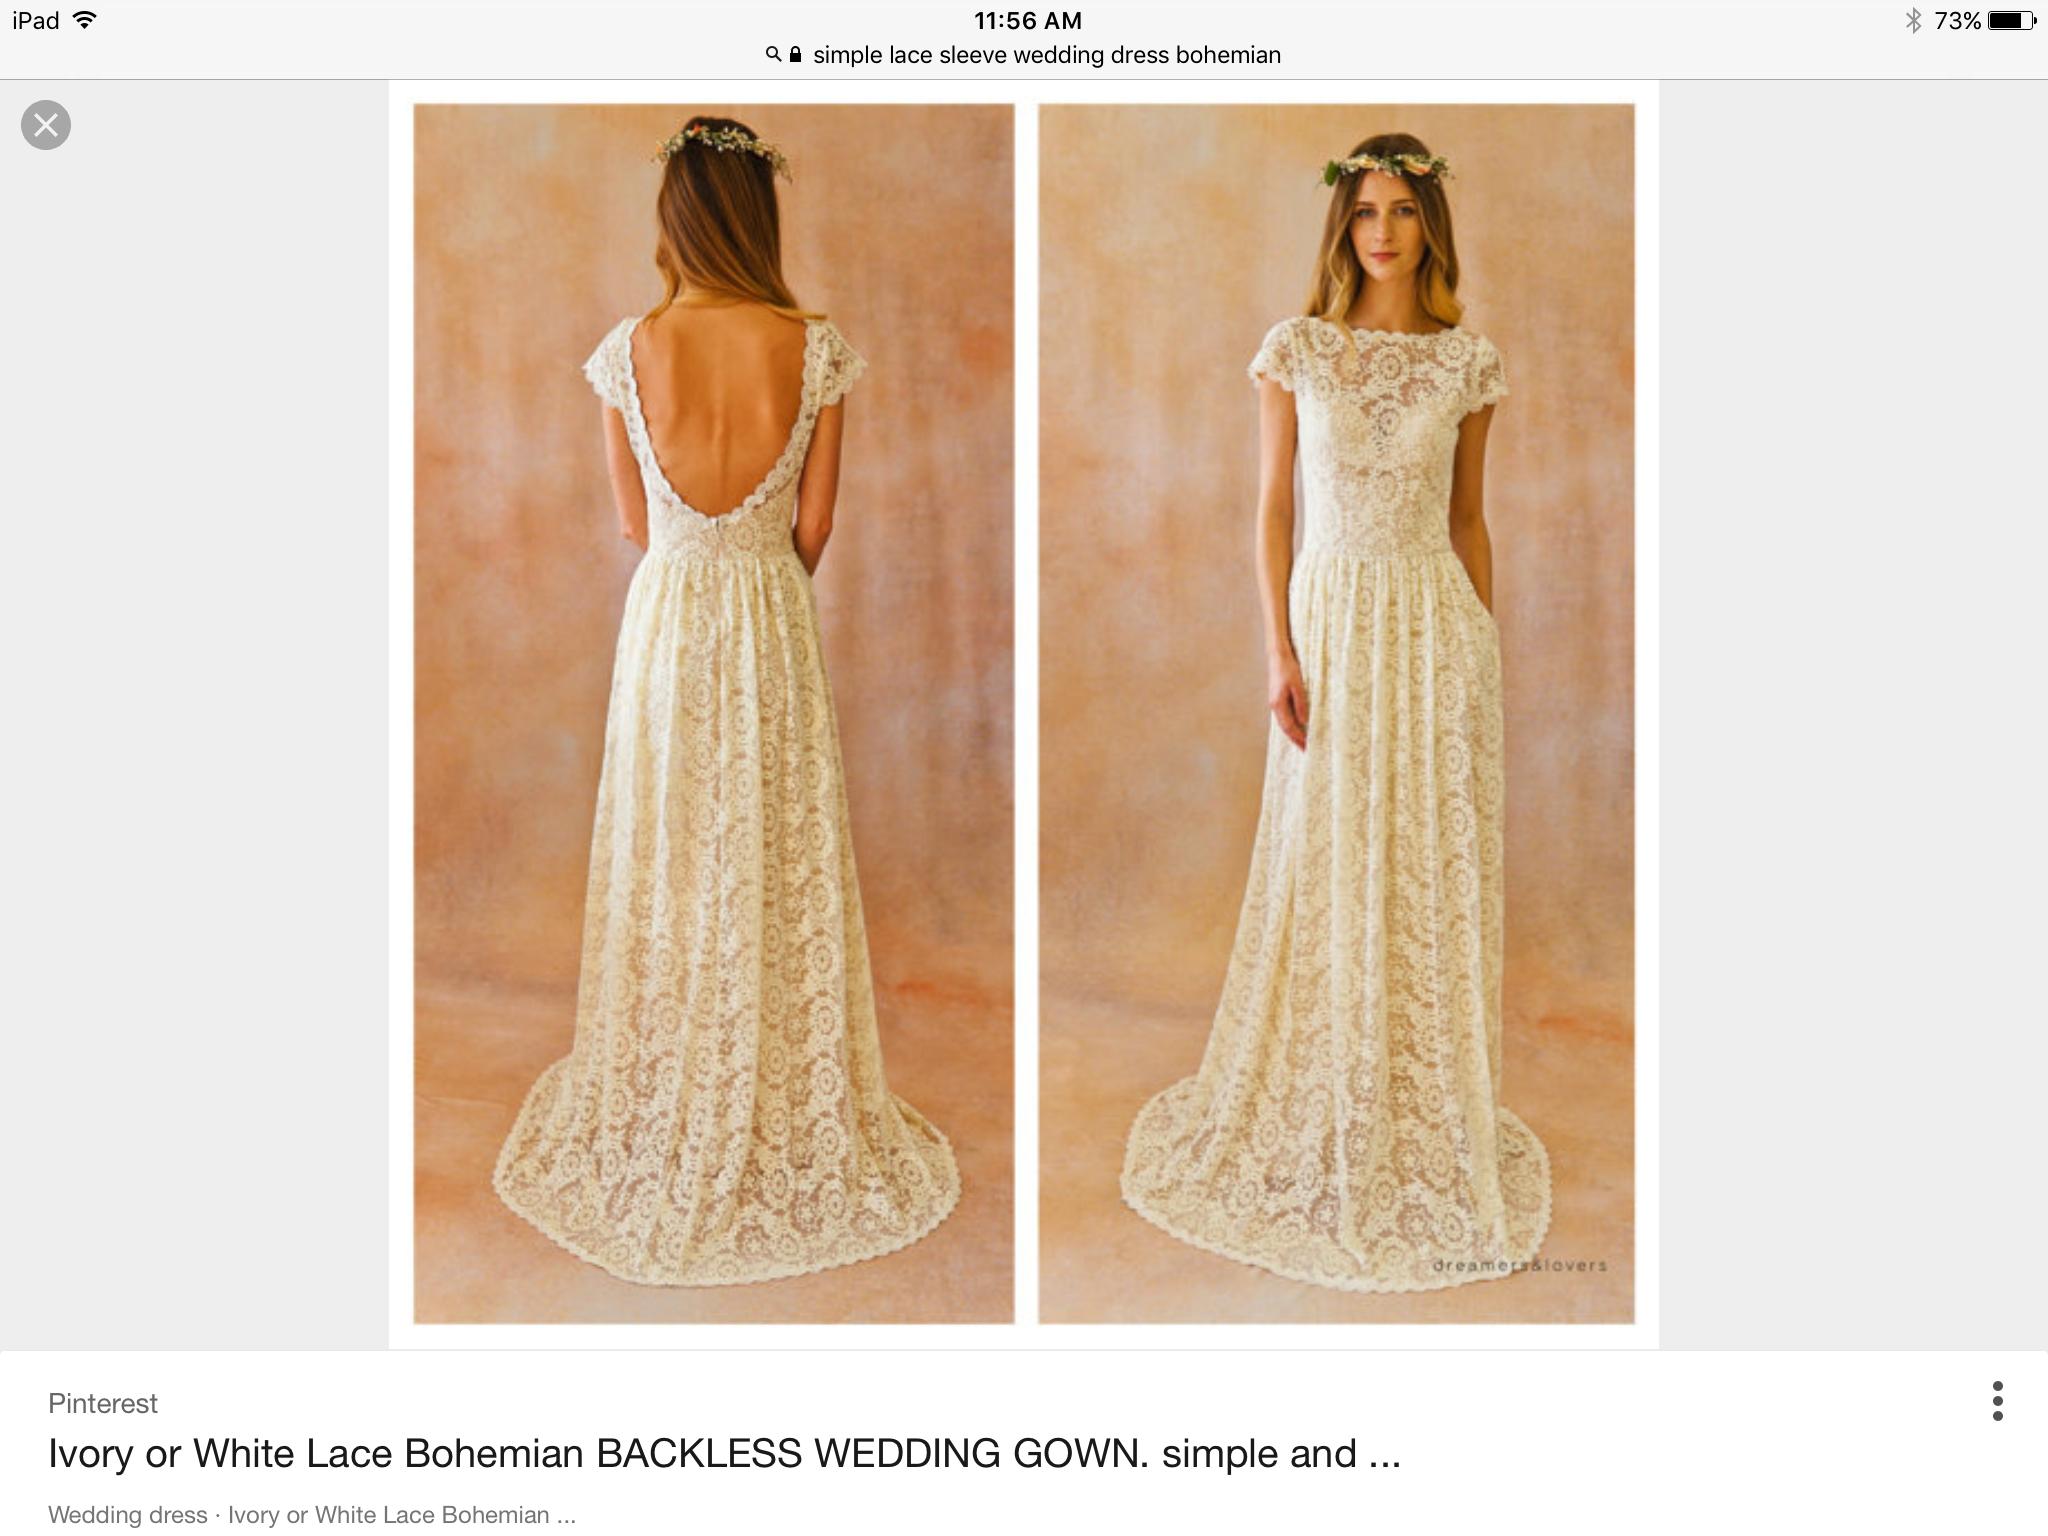 Pin by artistkaykay on wedding dresses pinterest wedding dress